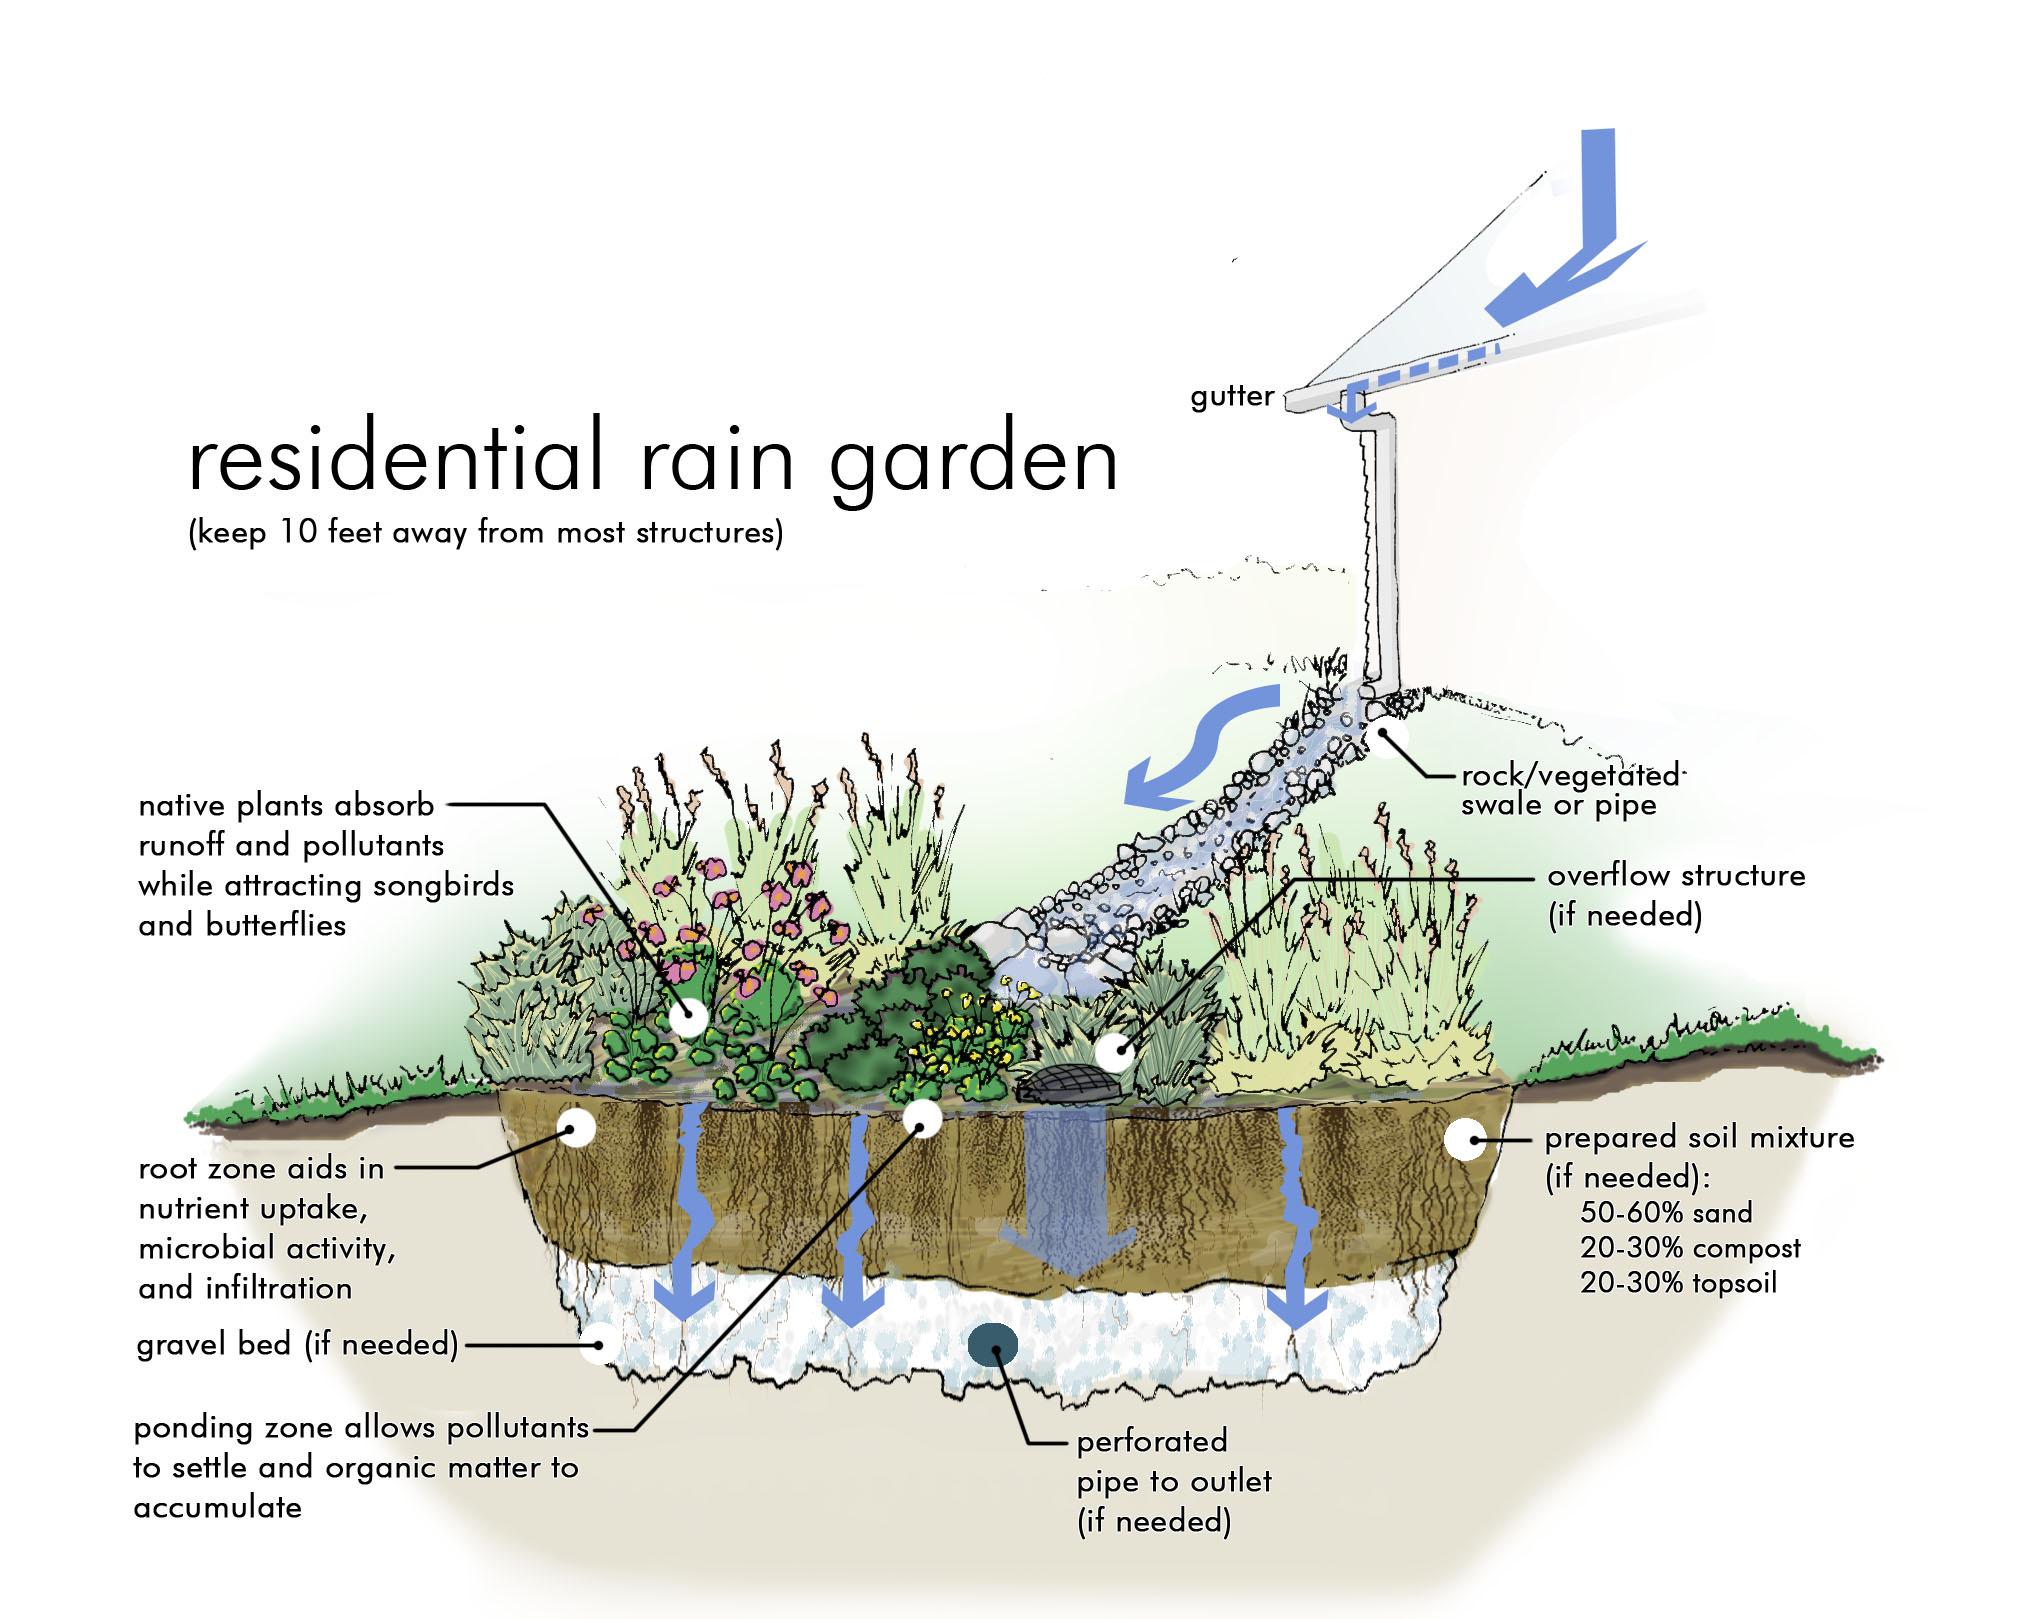 Rain Garden Ideas Free rain garden workshop in county the clermont sun workwithnaturefo